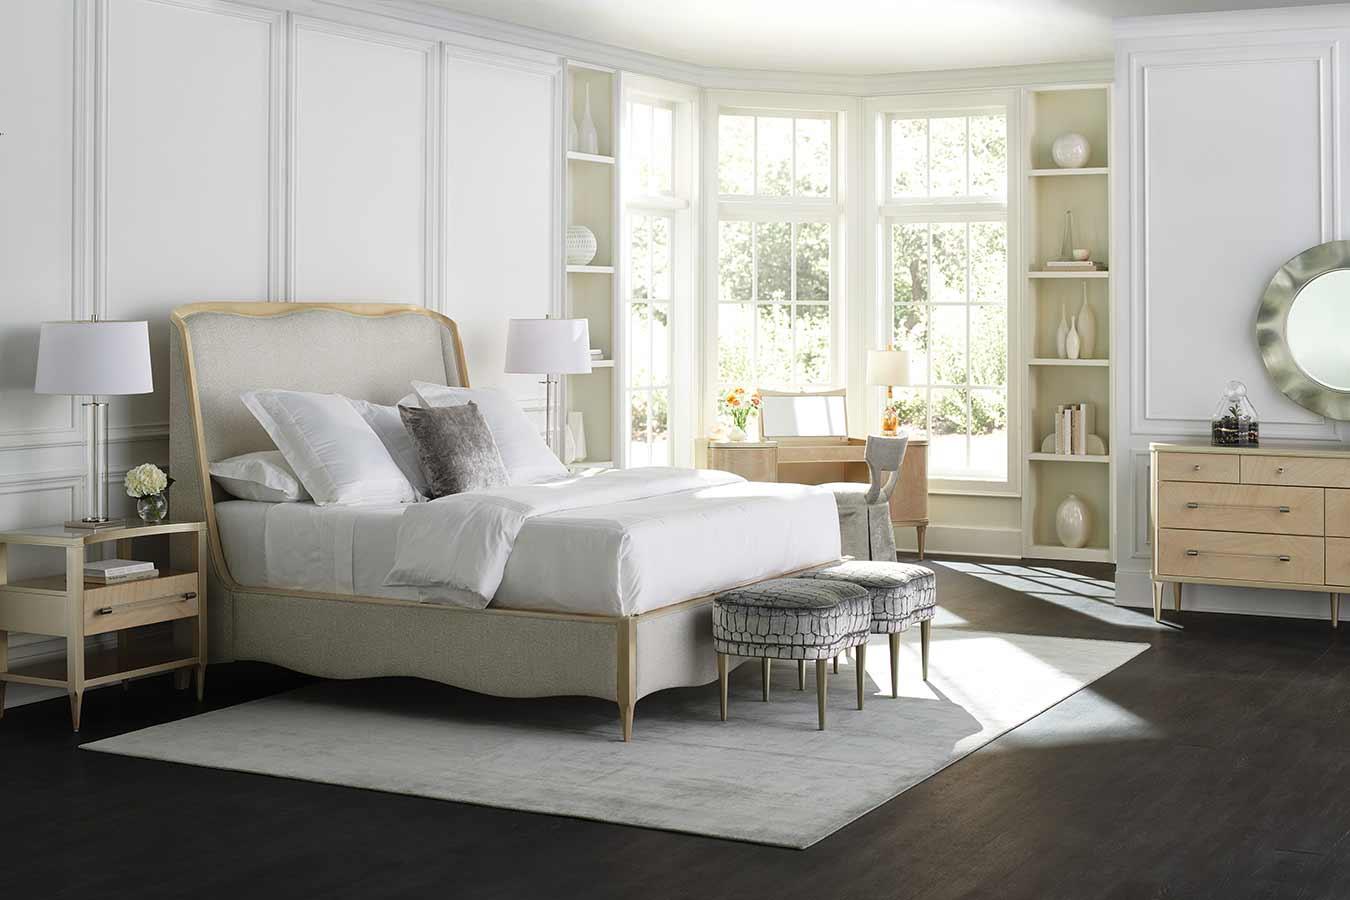 Deep Sleep Bedroom | Place Direct | Contemporary Luxury Exclusive Designer Modern High End Furniture | Sandton Johannesburg